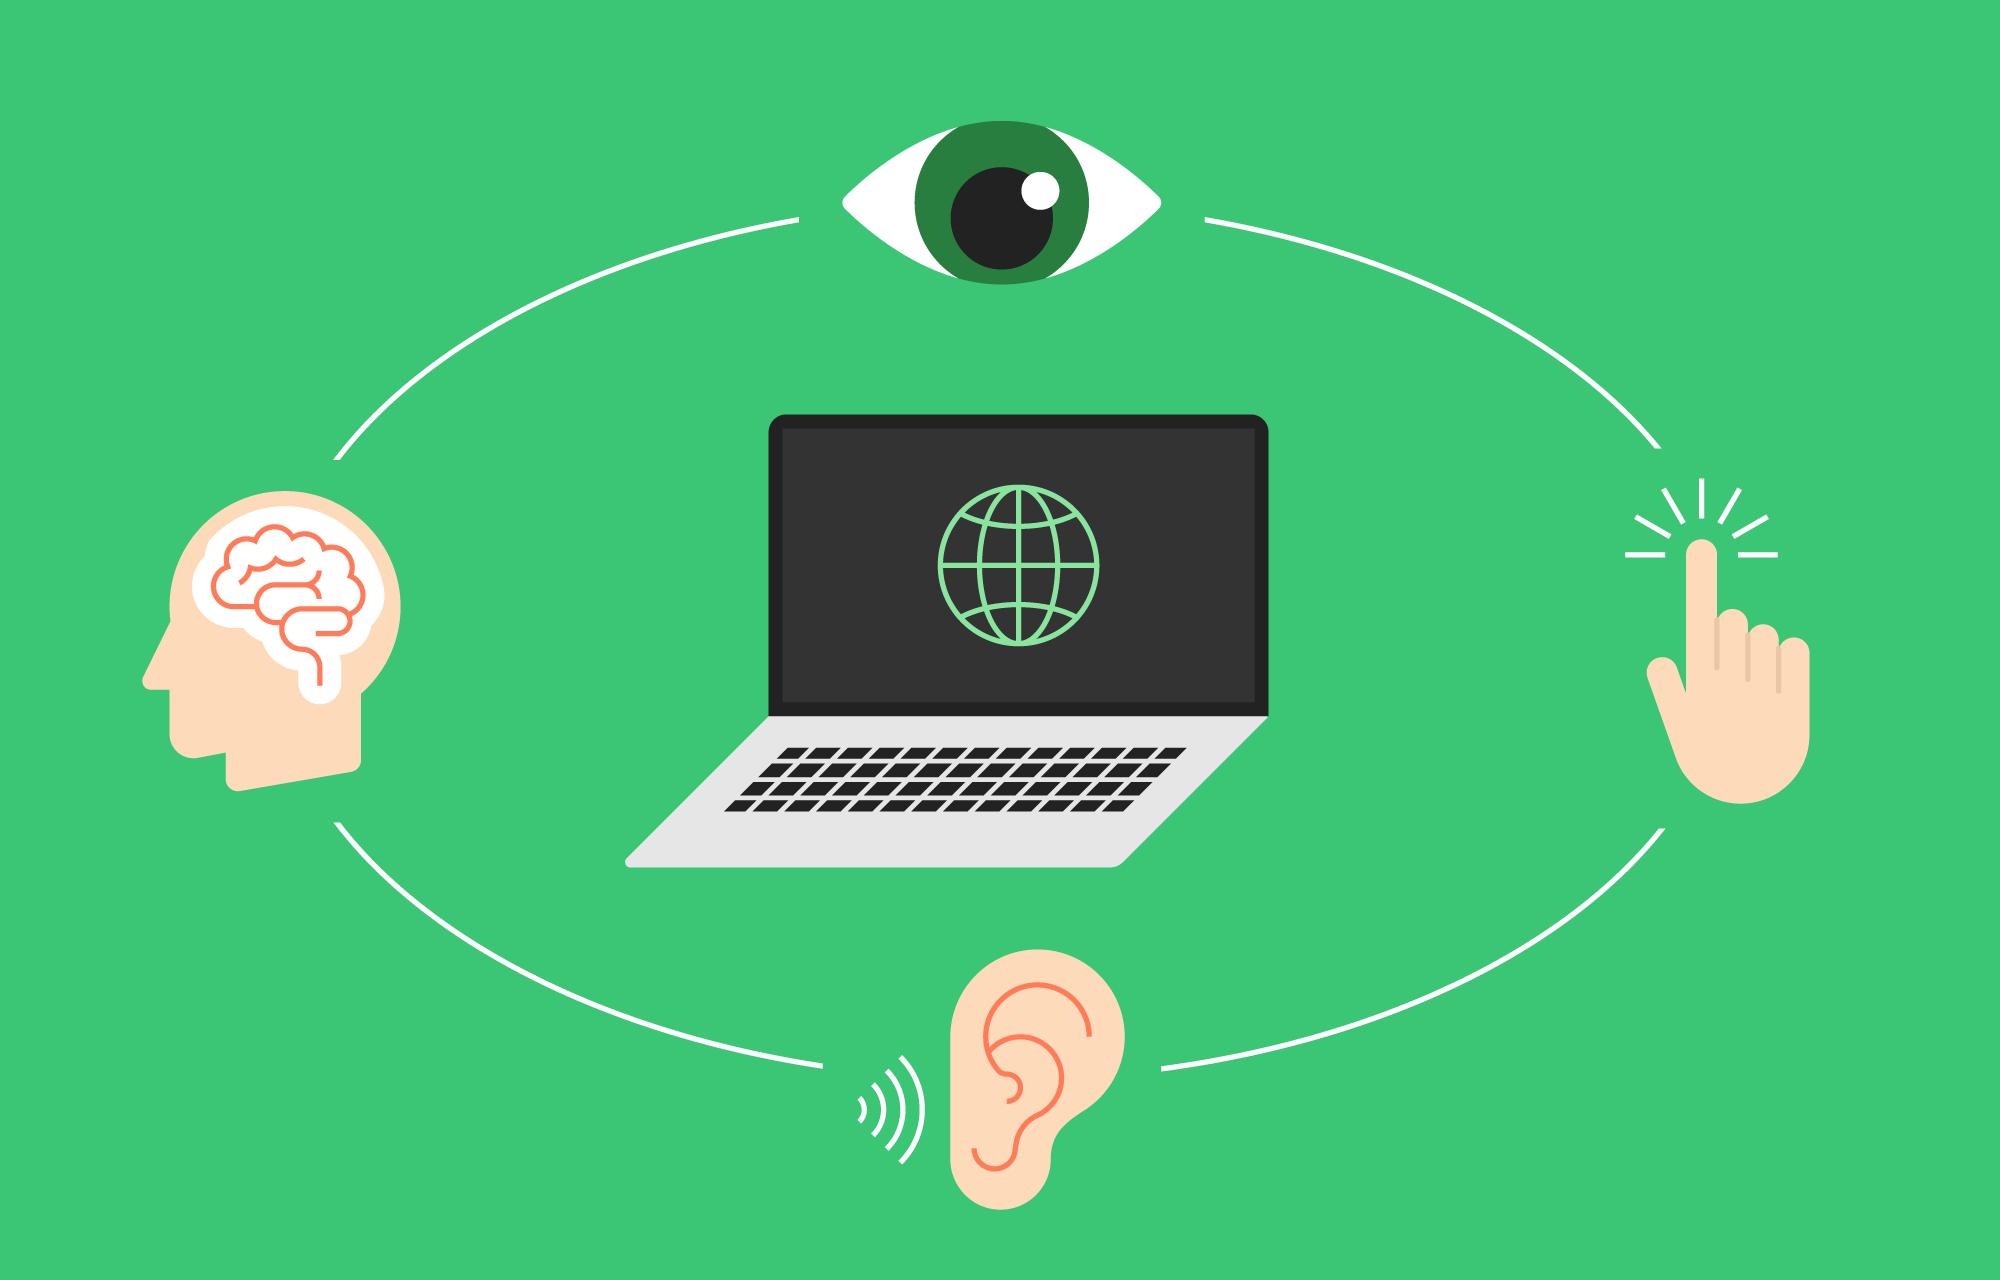 Et øye, en hånd, et øre og en hjerne rundt en datamaskin.